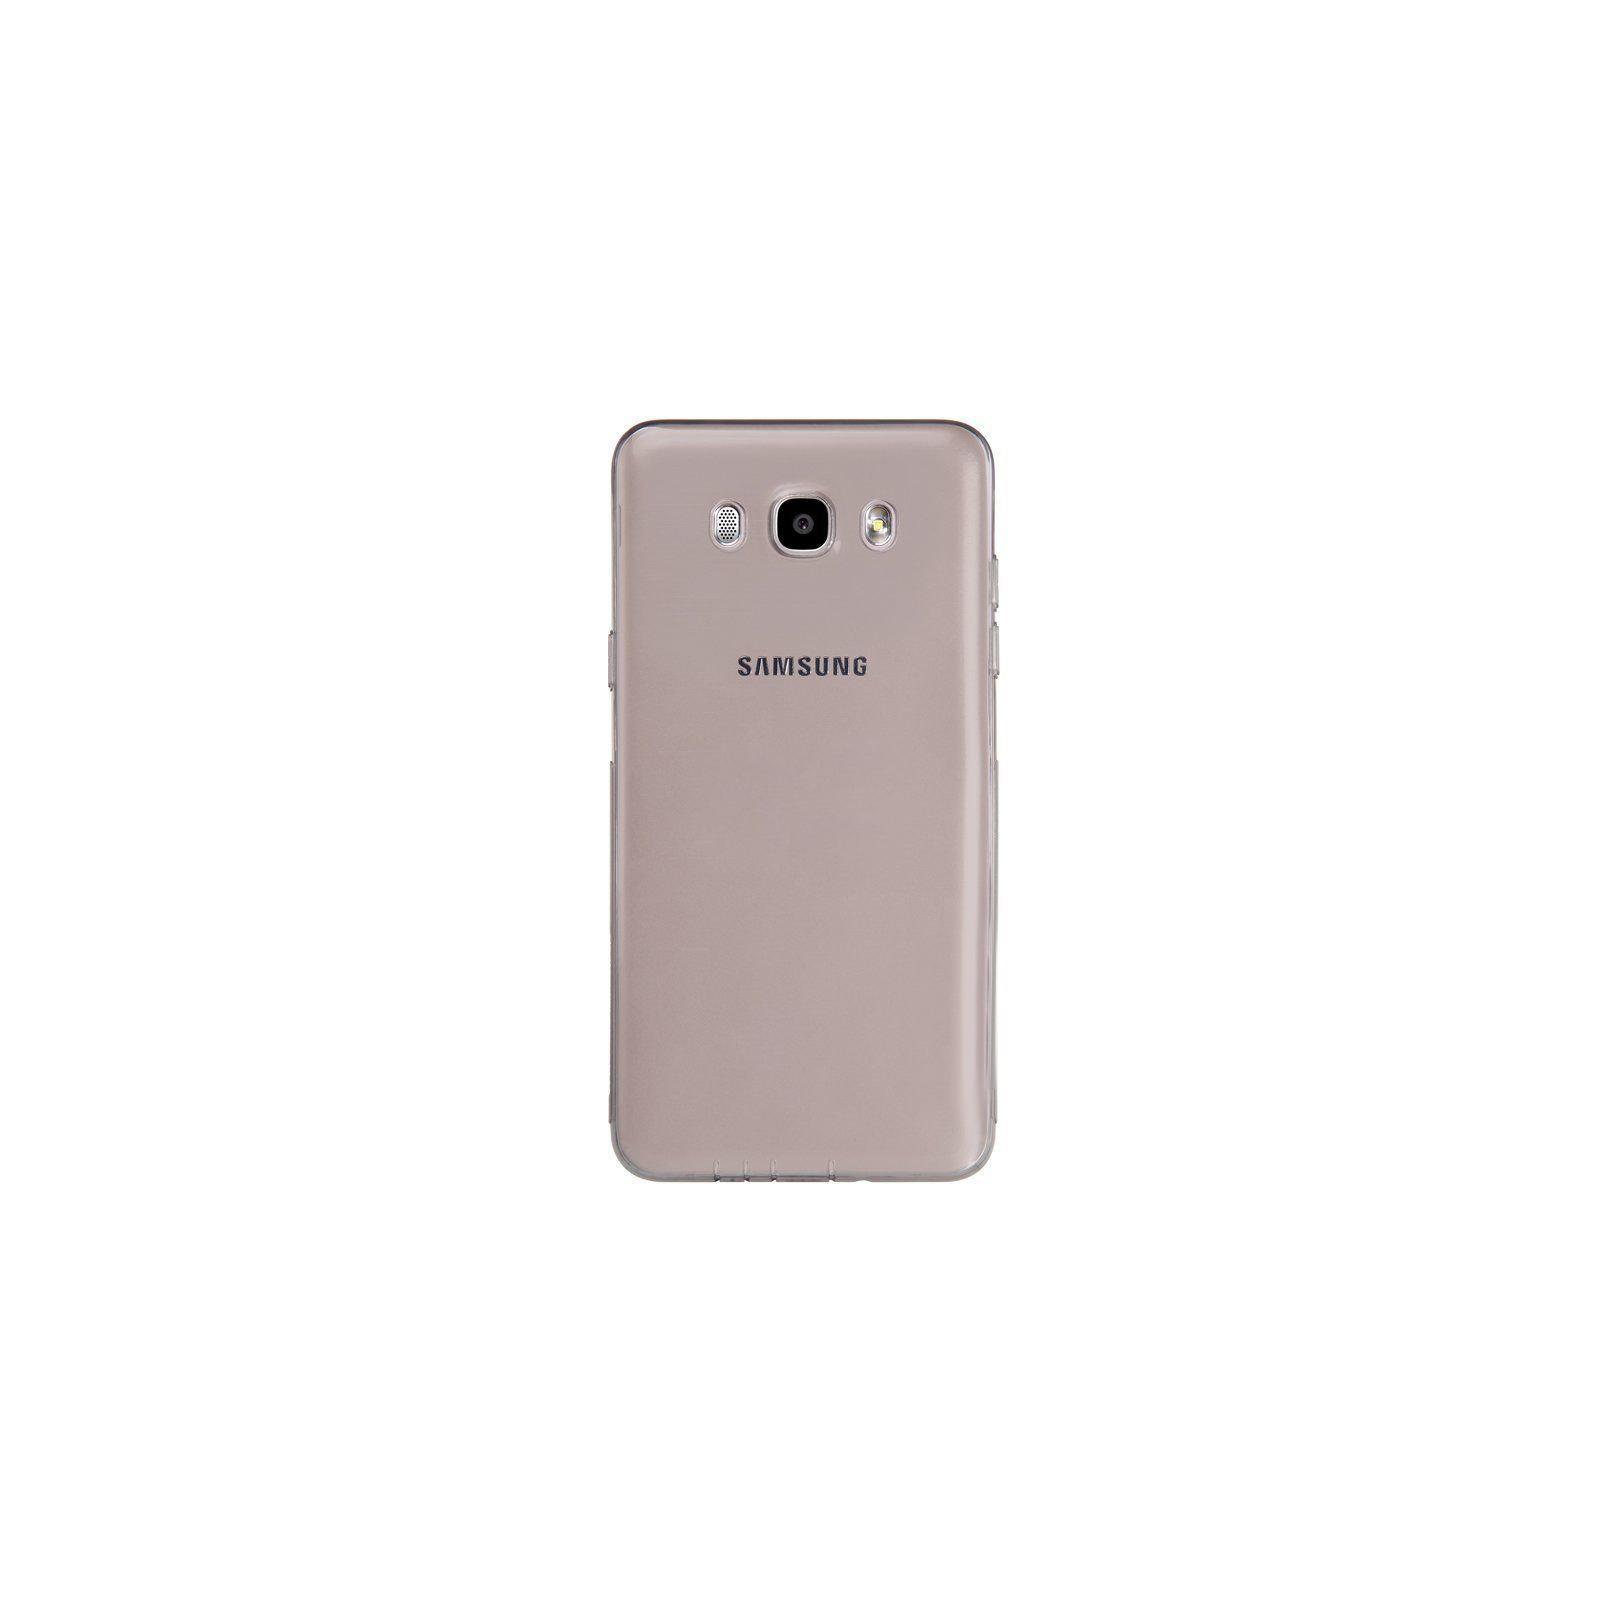 Чехол для моб. телефона SmartCase Samsung Galaxy J7 / J710 TPU Clear (SC-J710) изображение 3